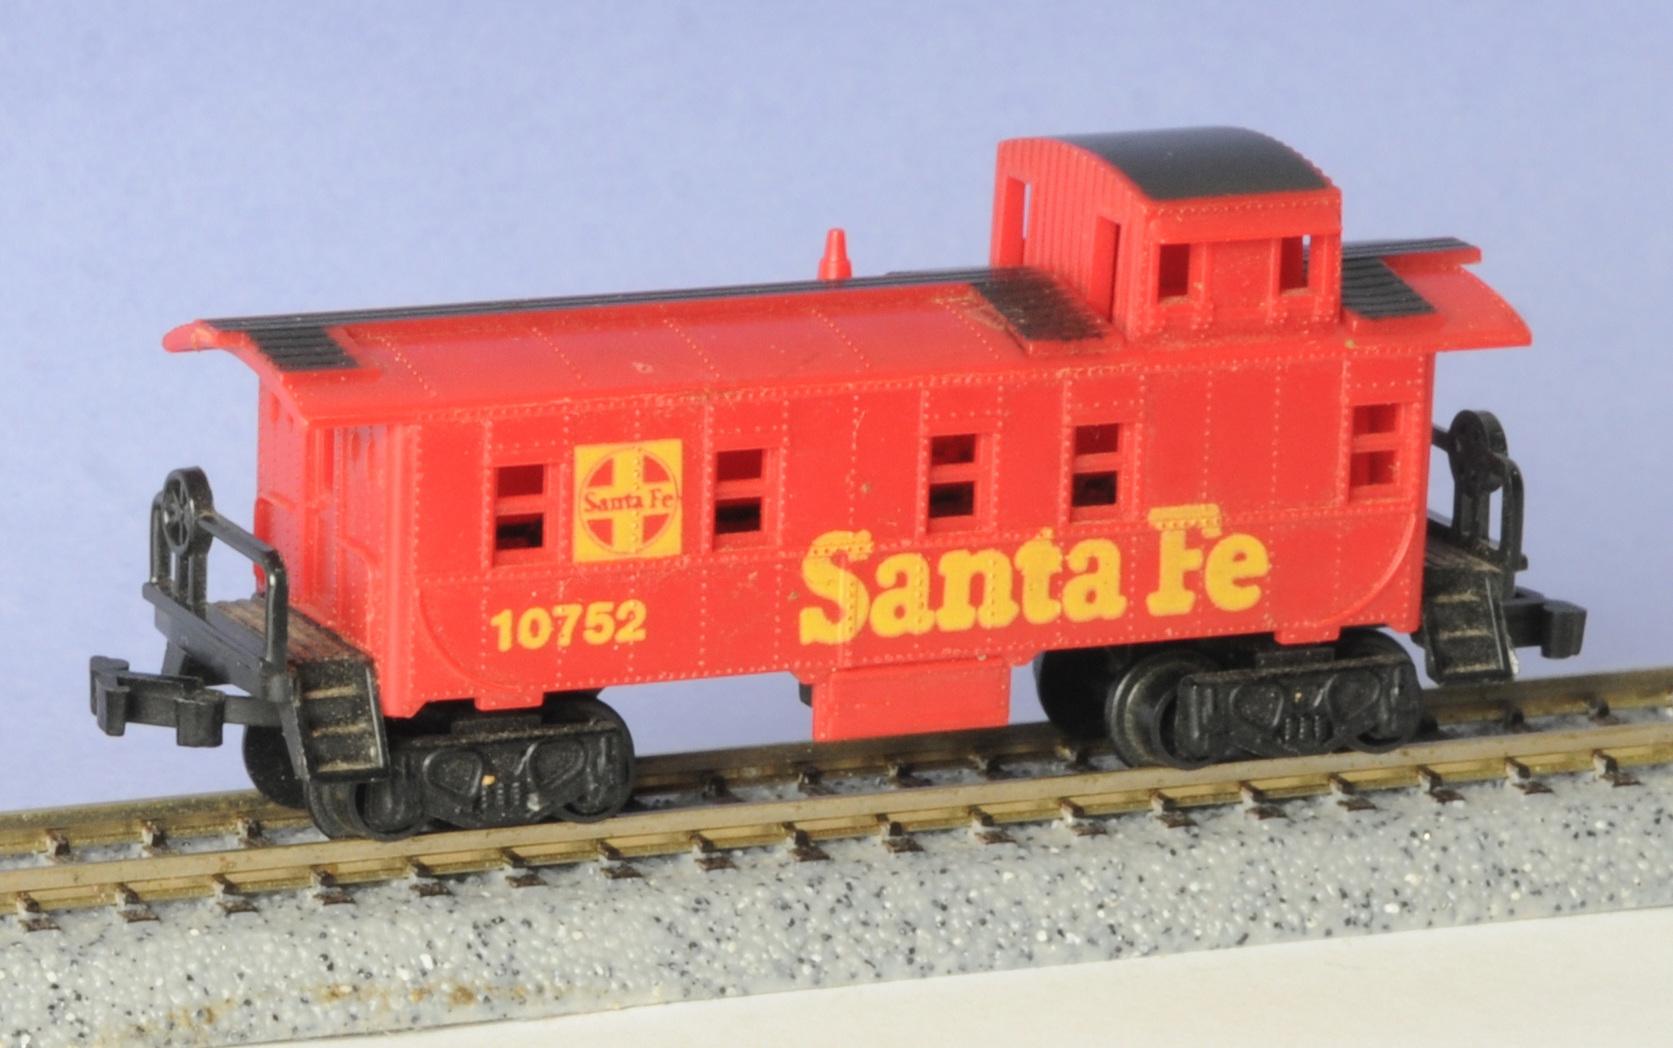 N Scale - Aurora Rail Masters - 5475-300G - Caboose, Cupola, Steel - Chessie System